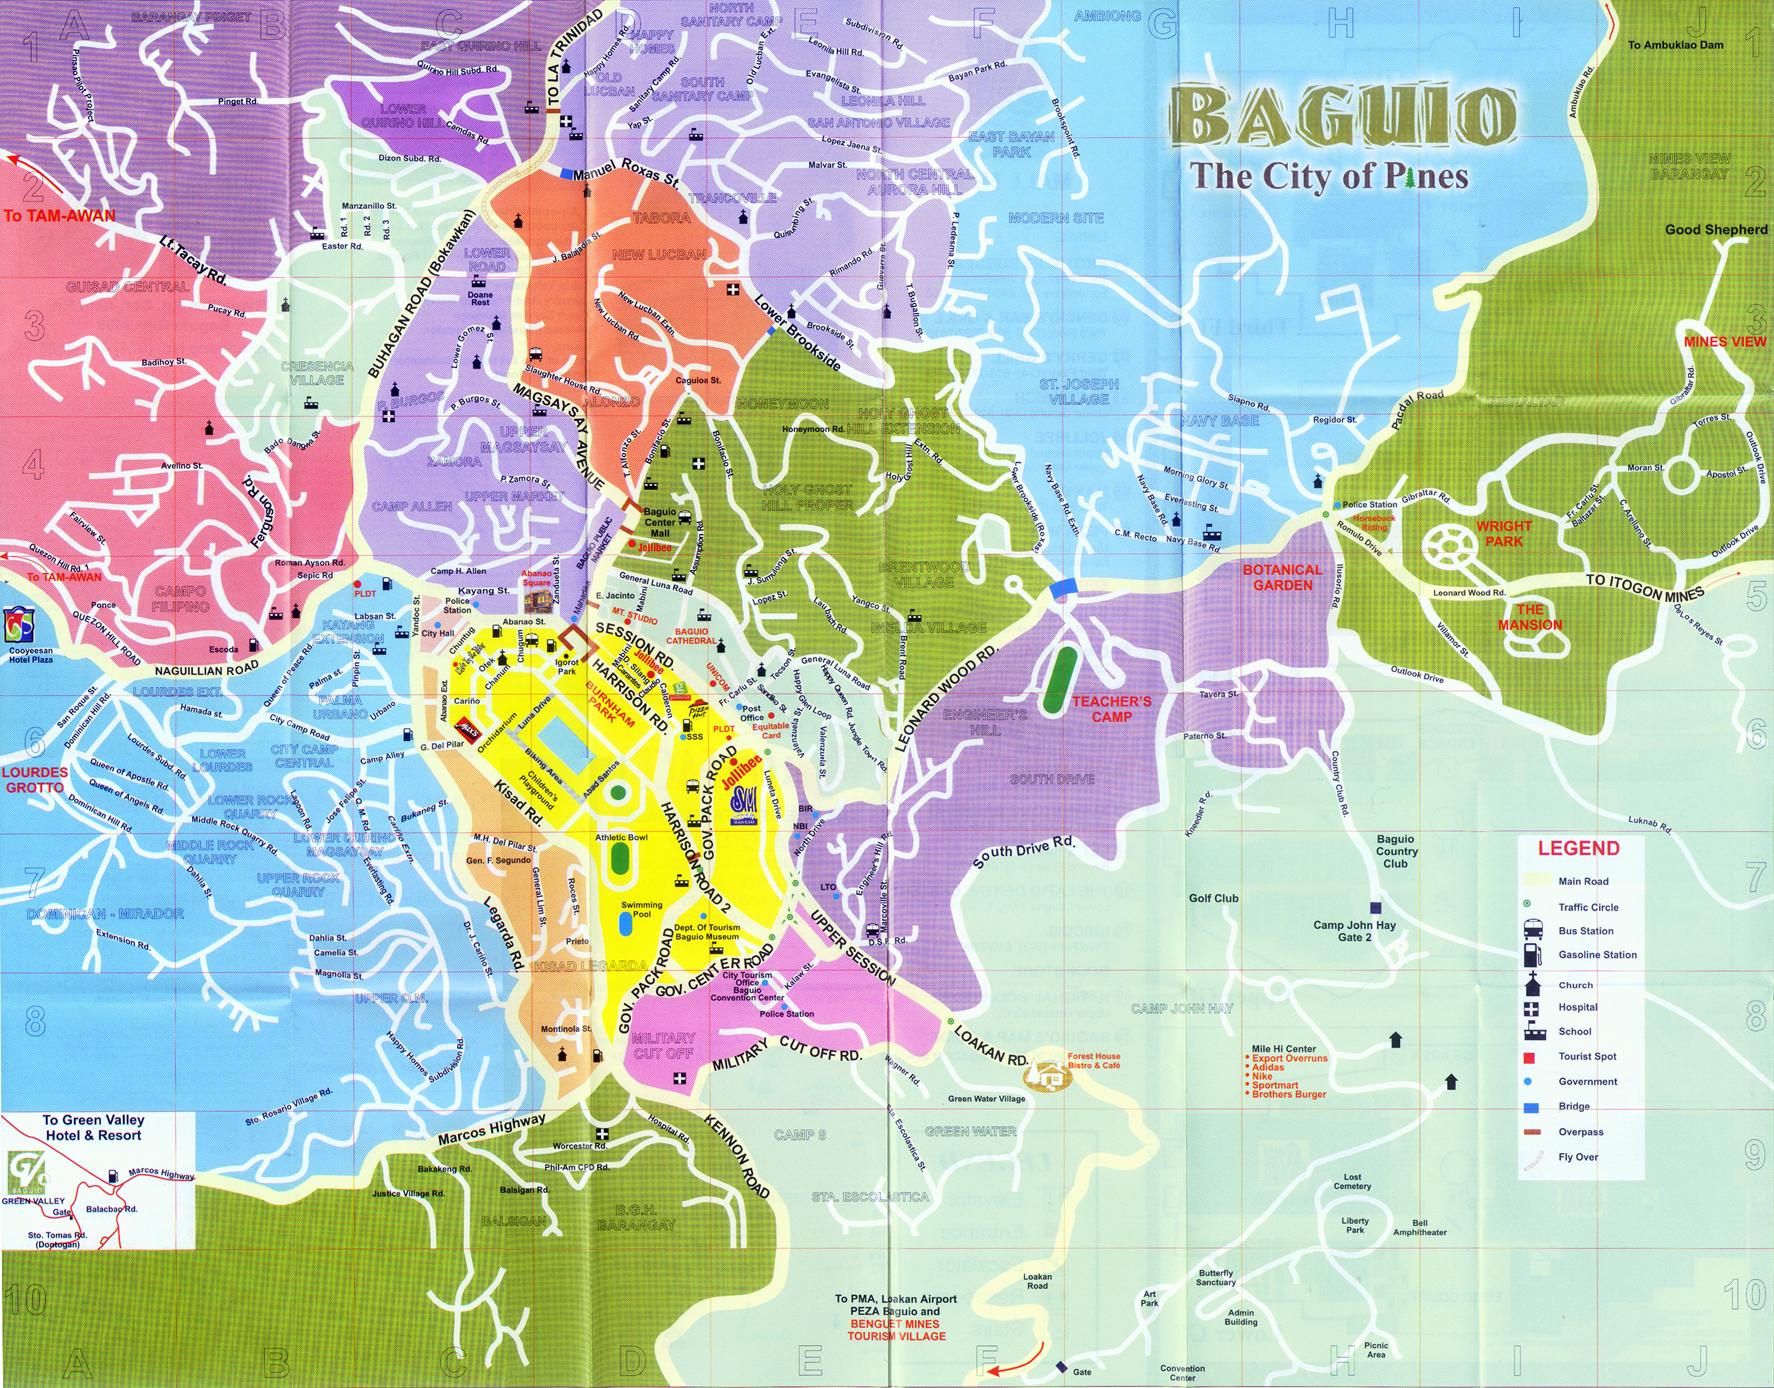 Baguio Map Baguio Phillipines Mappery - Baguio map